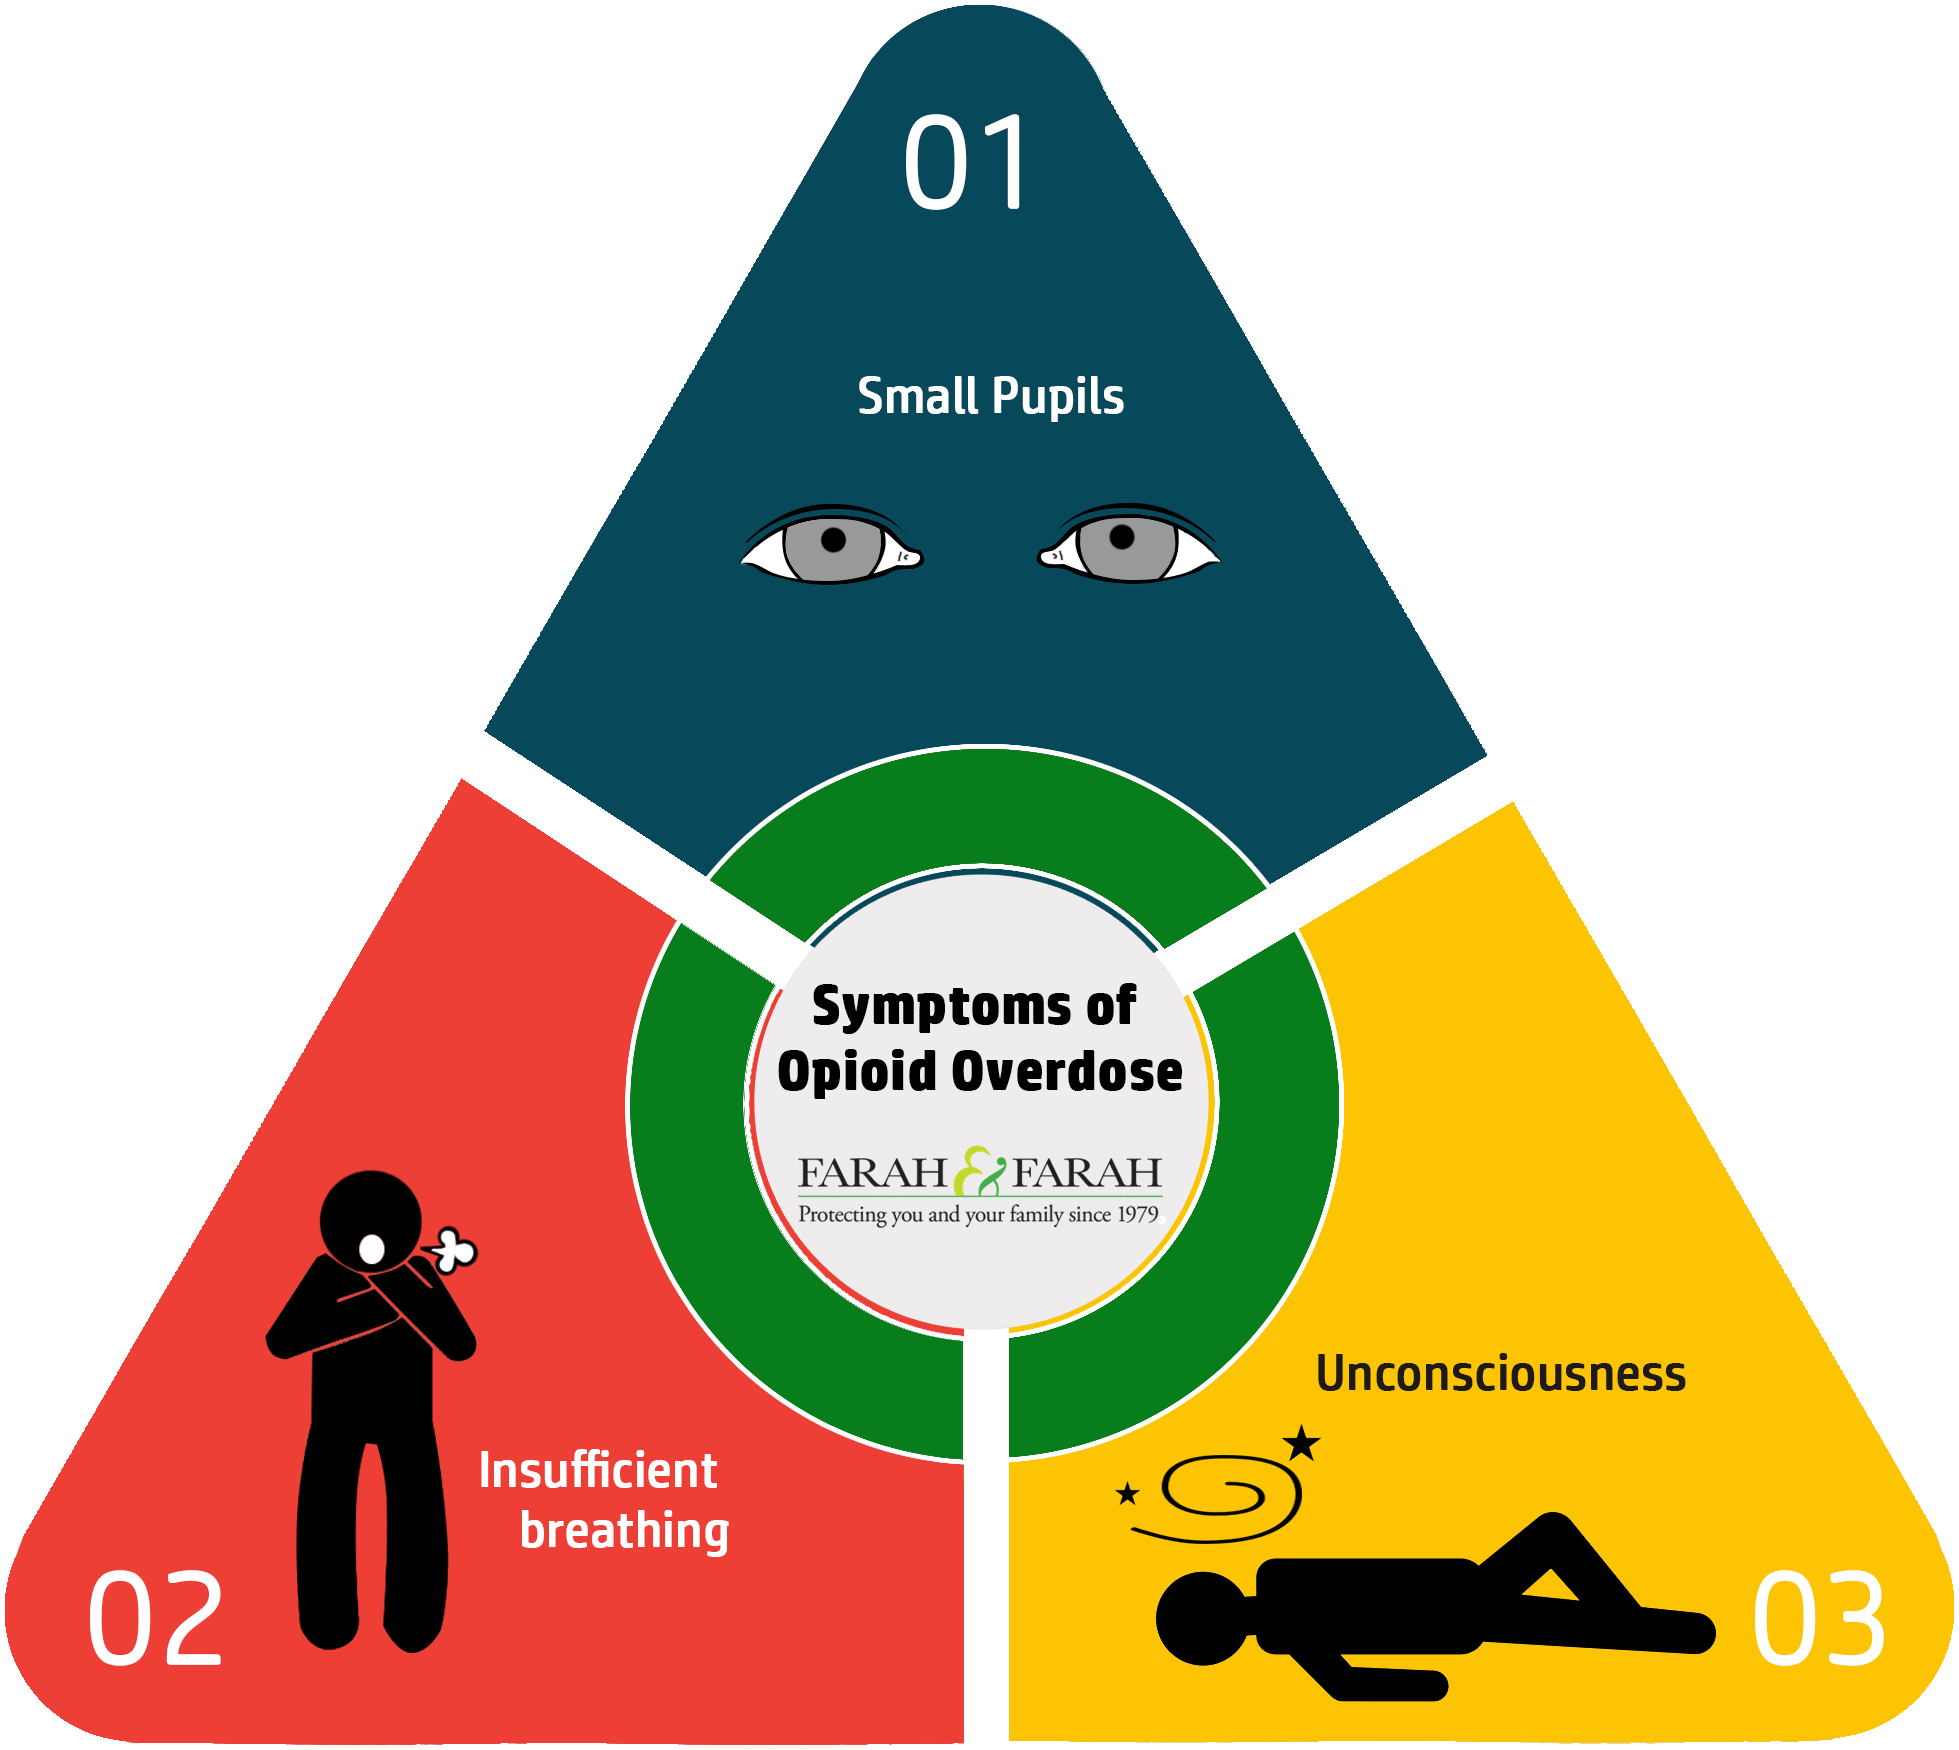 Symptoms of Opioid Overdose